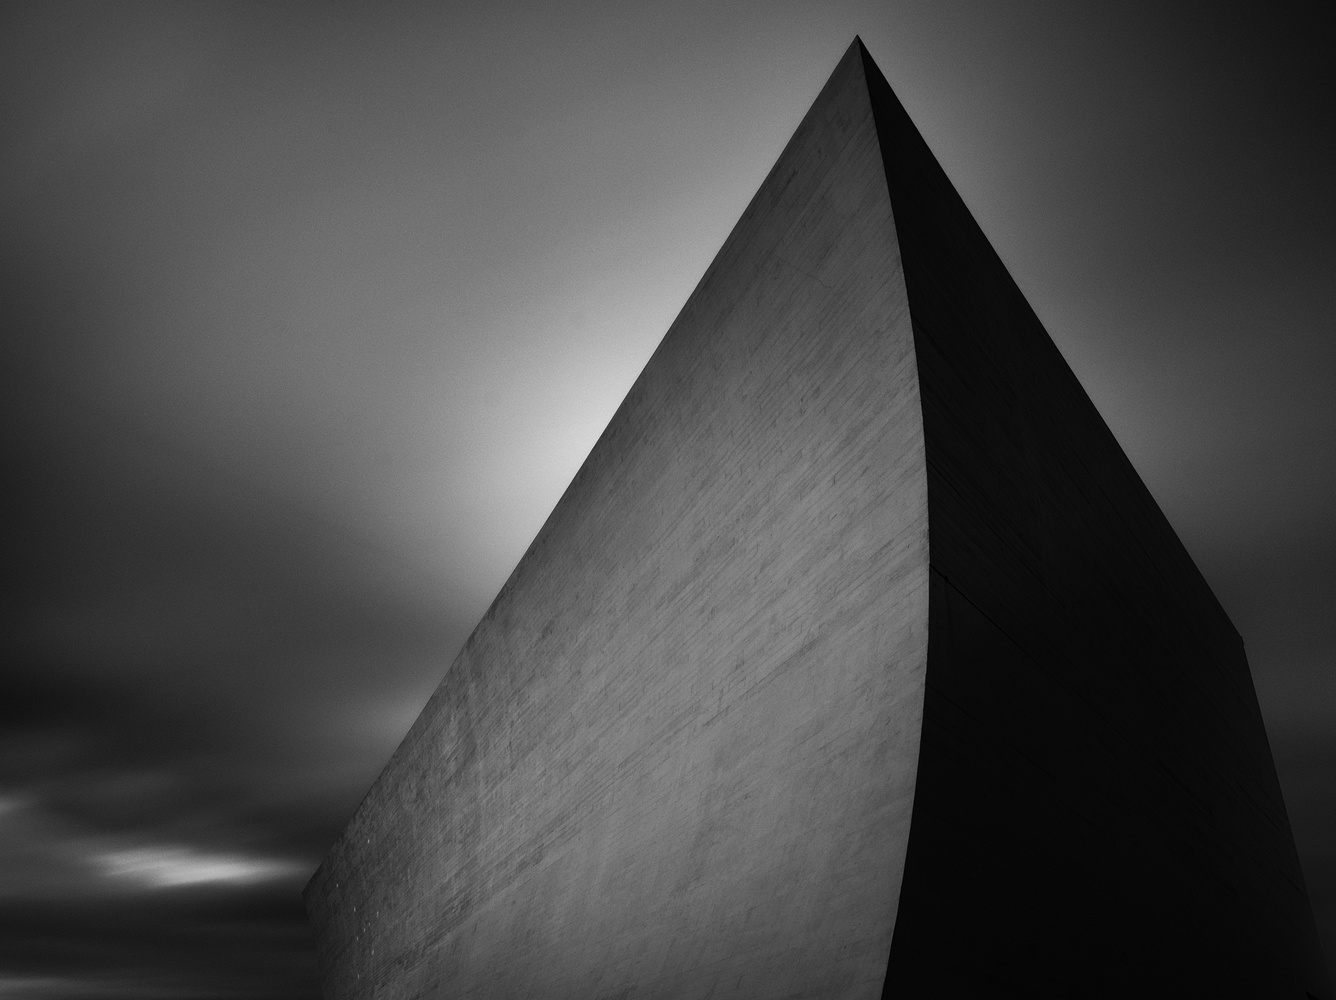 Untitled 1 by Mark Brueggenjohann